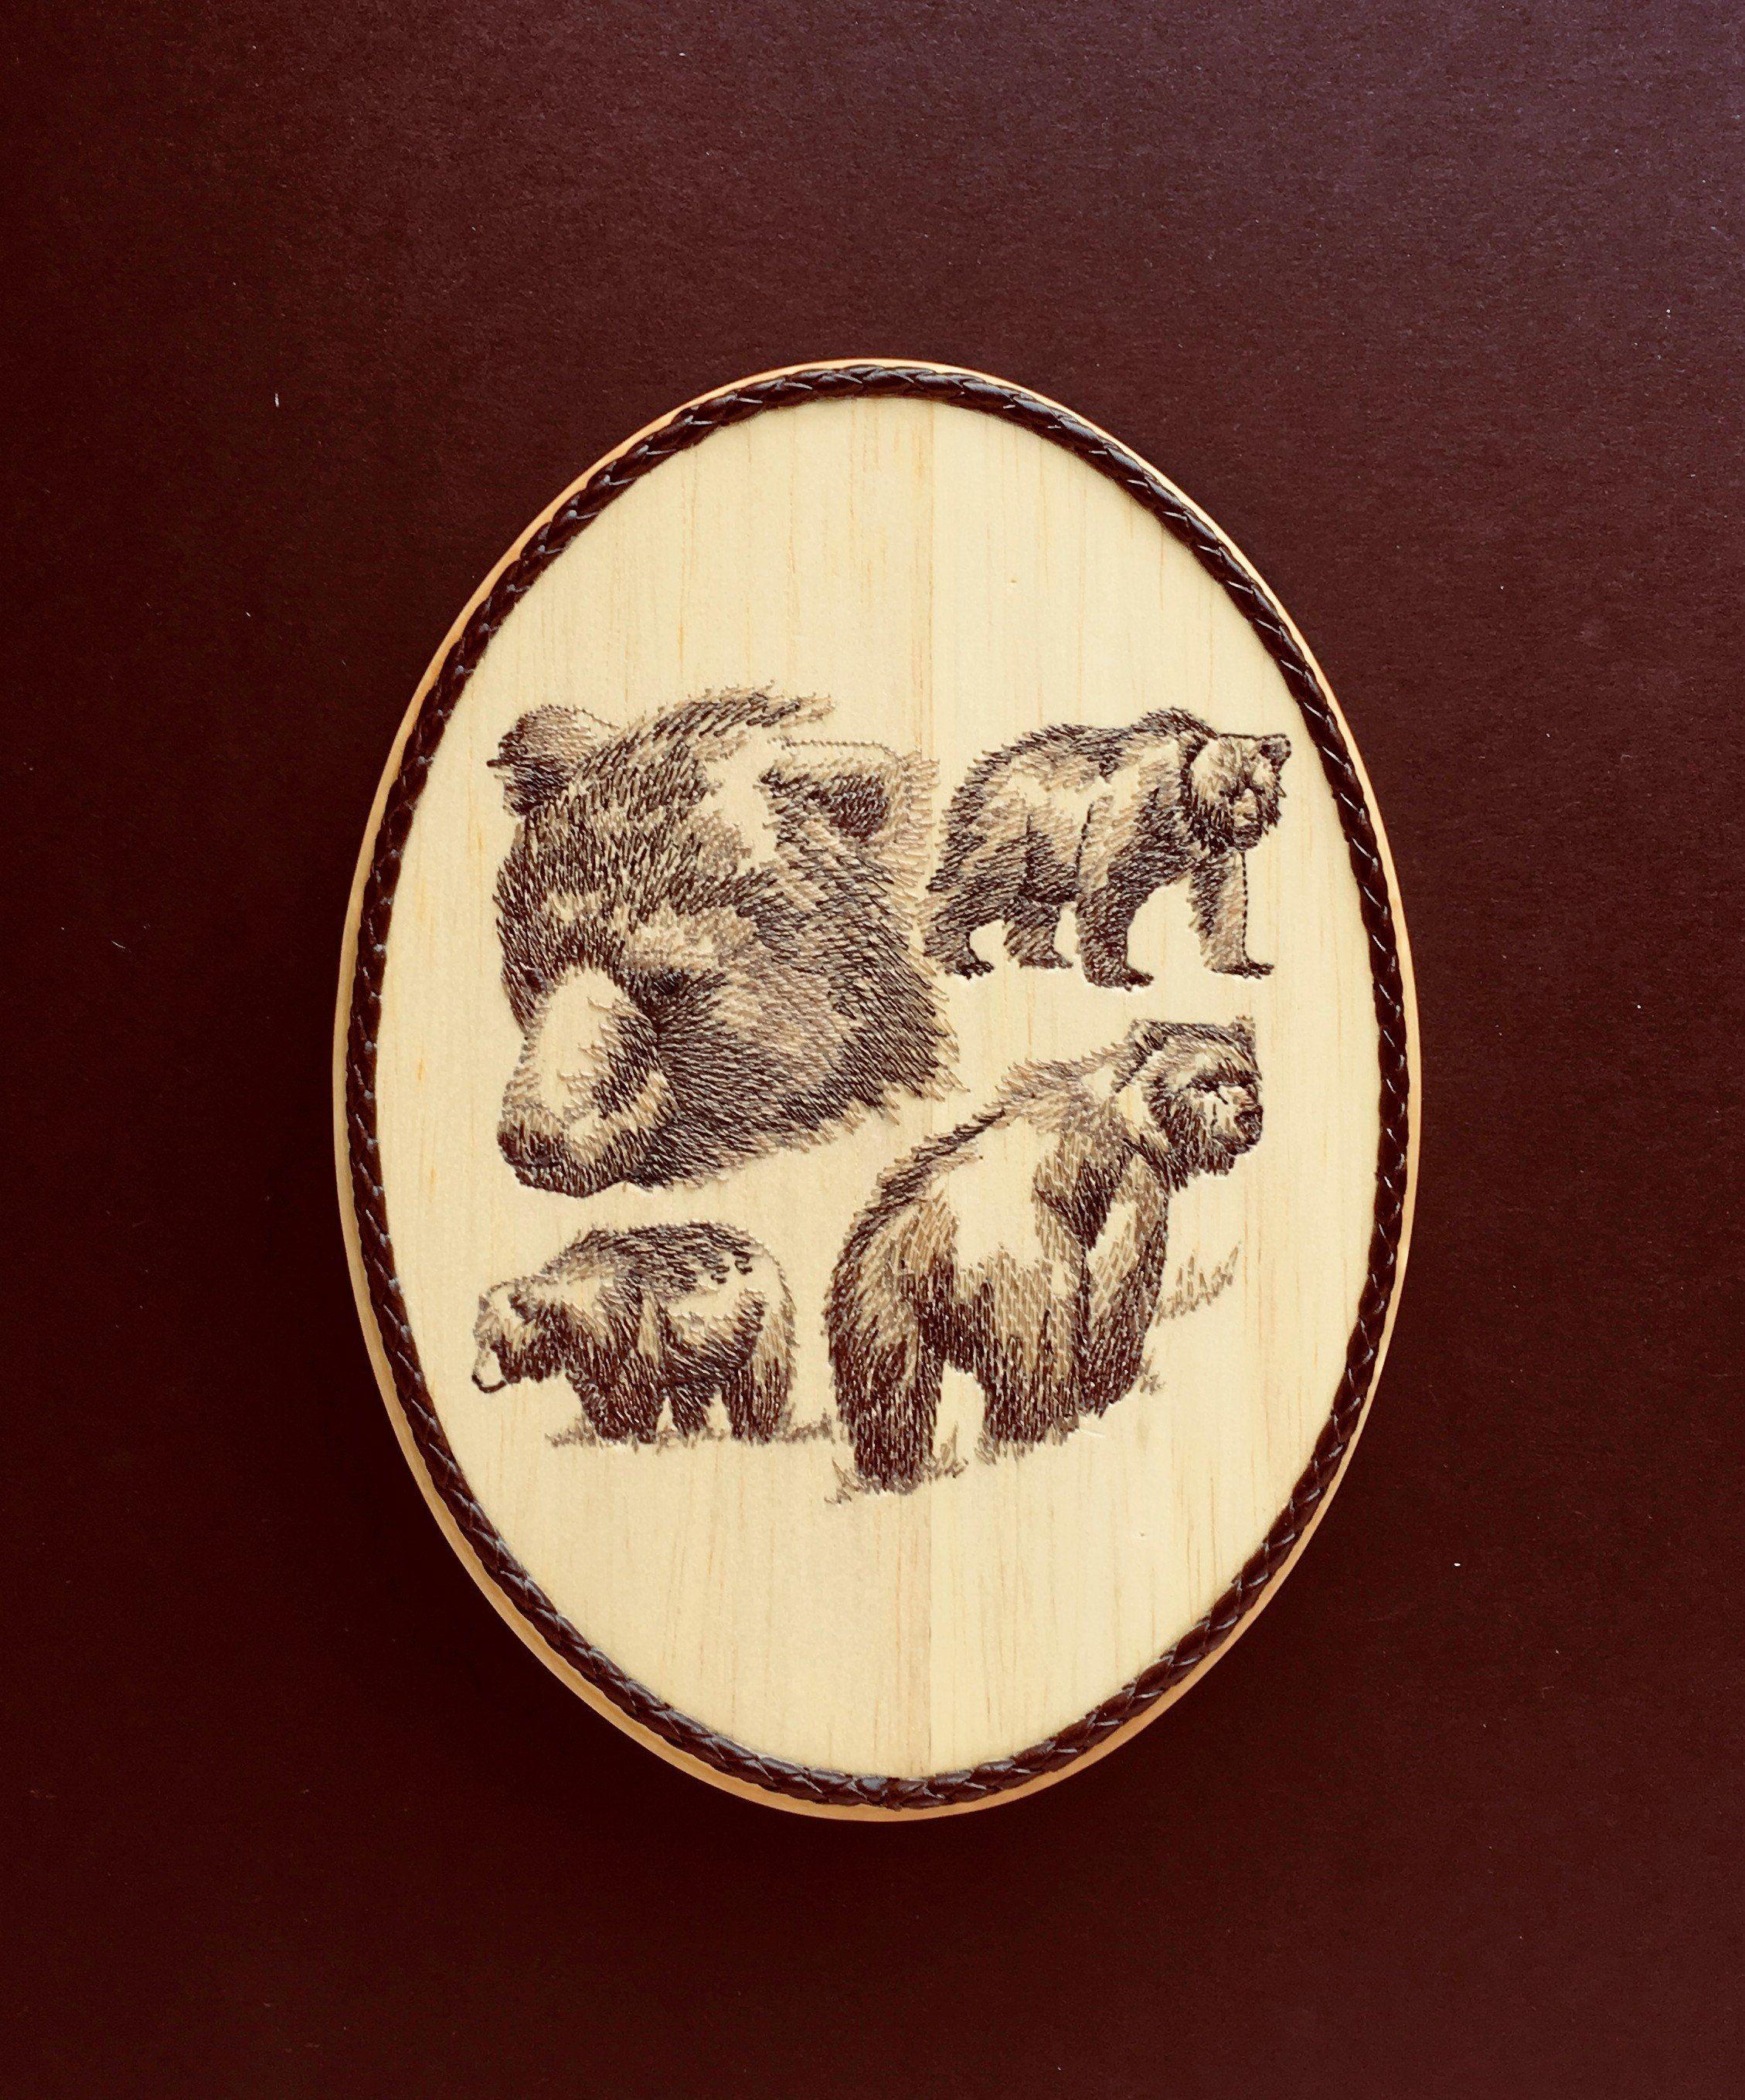 Brown bear wall decor embroidery art on balsa wood woodland